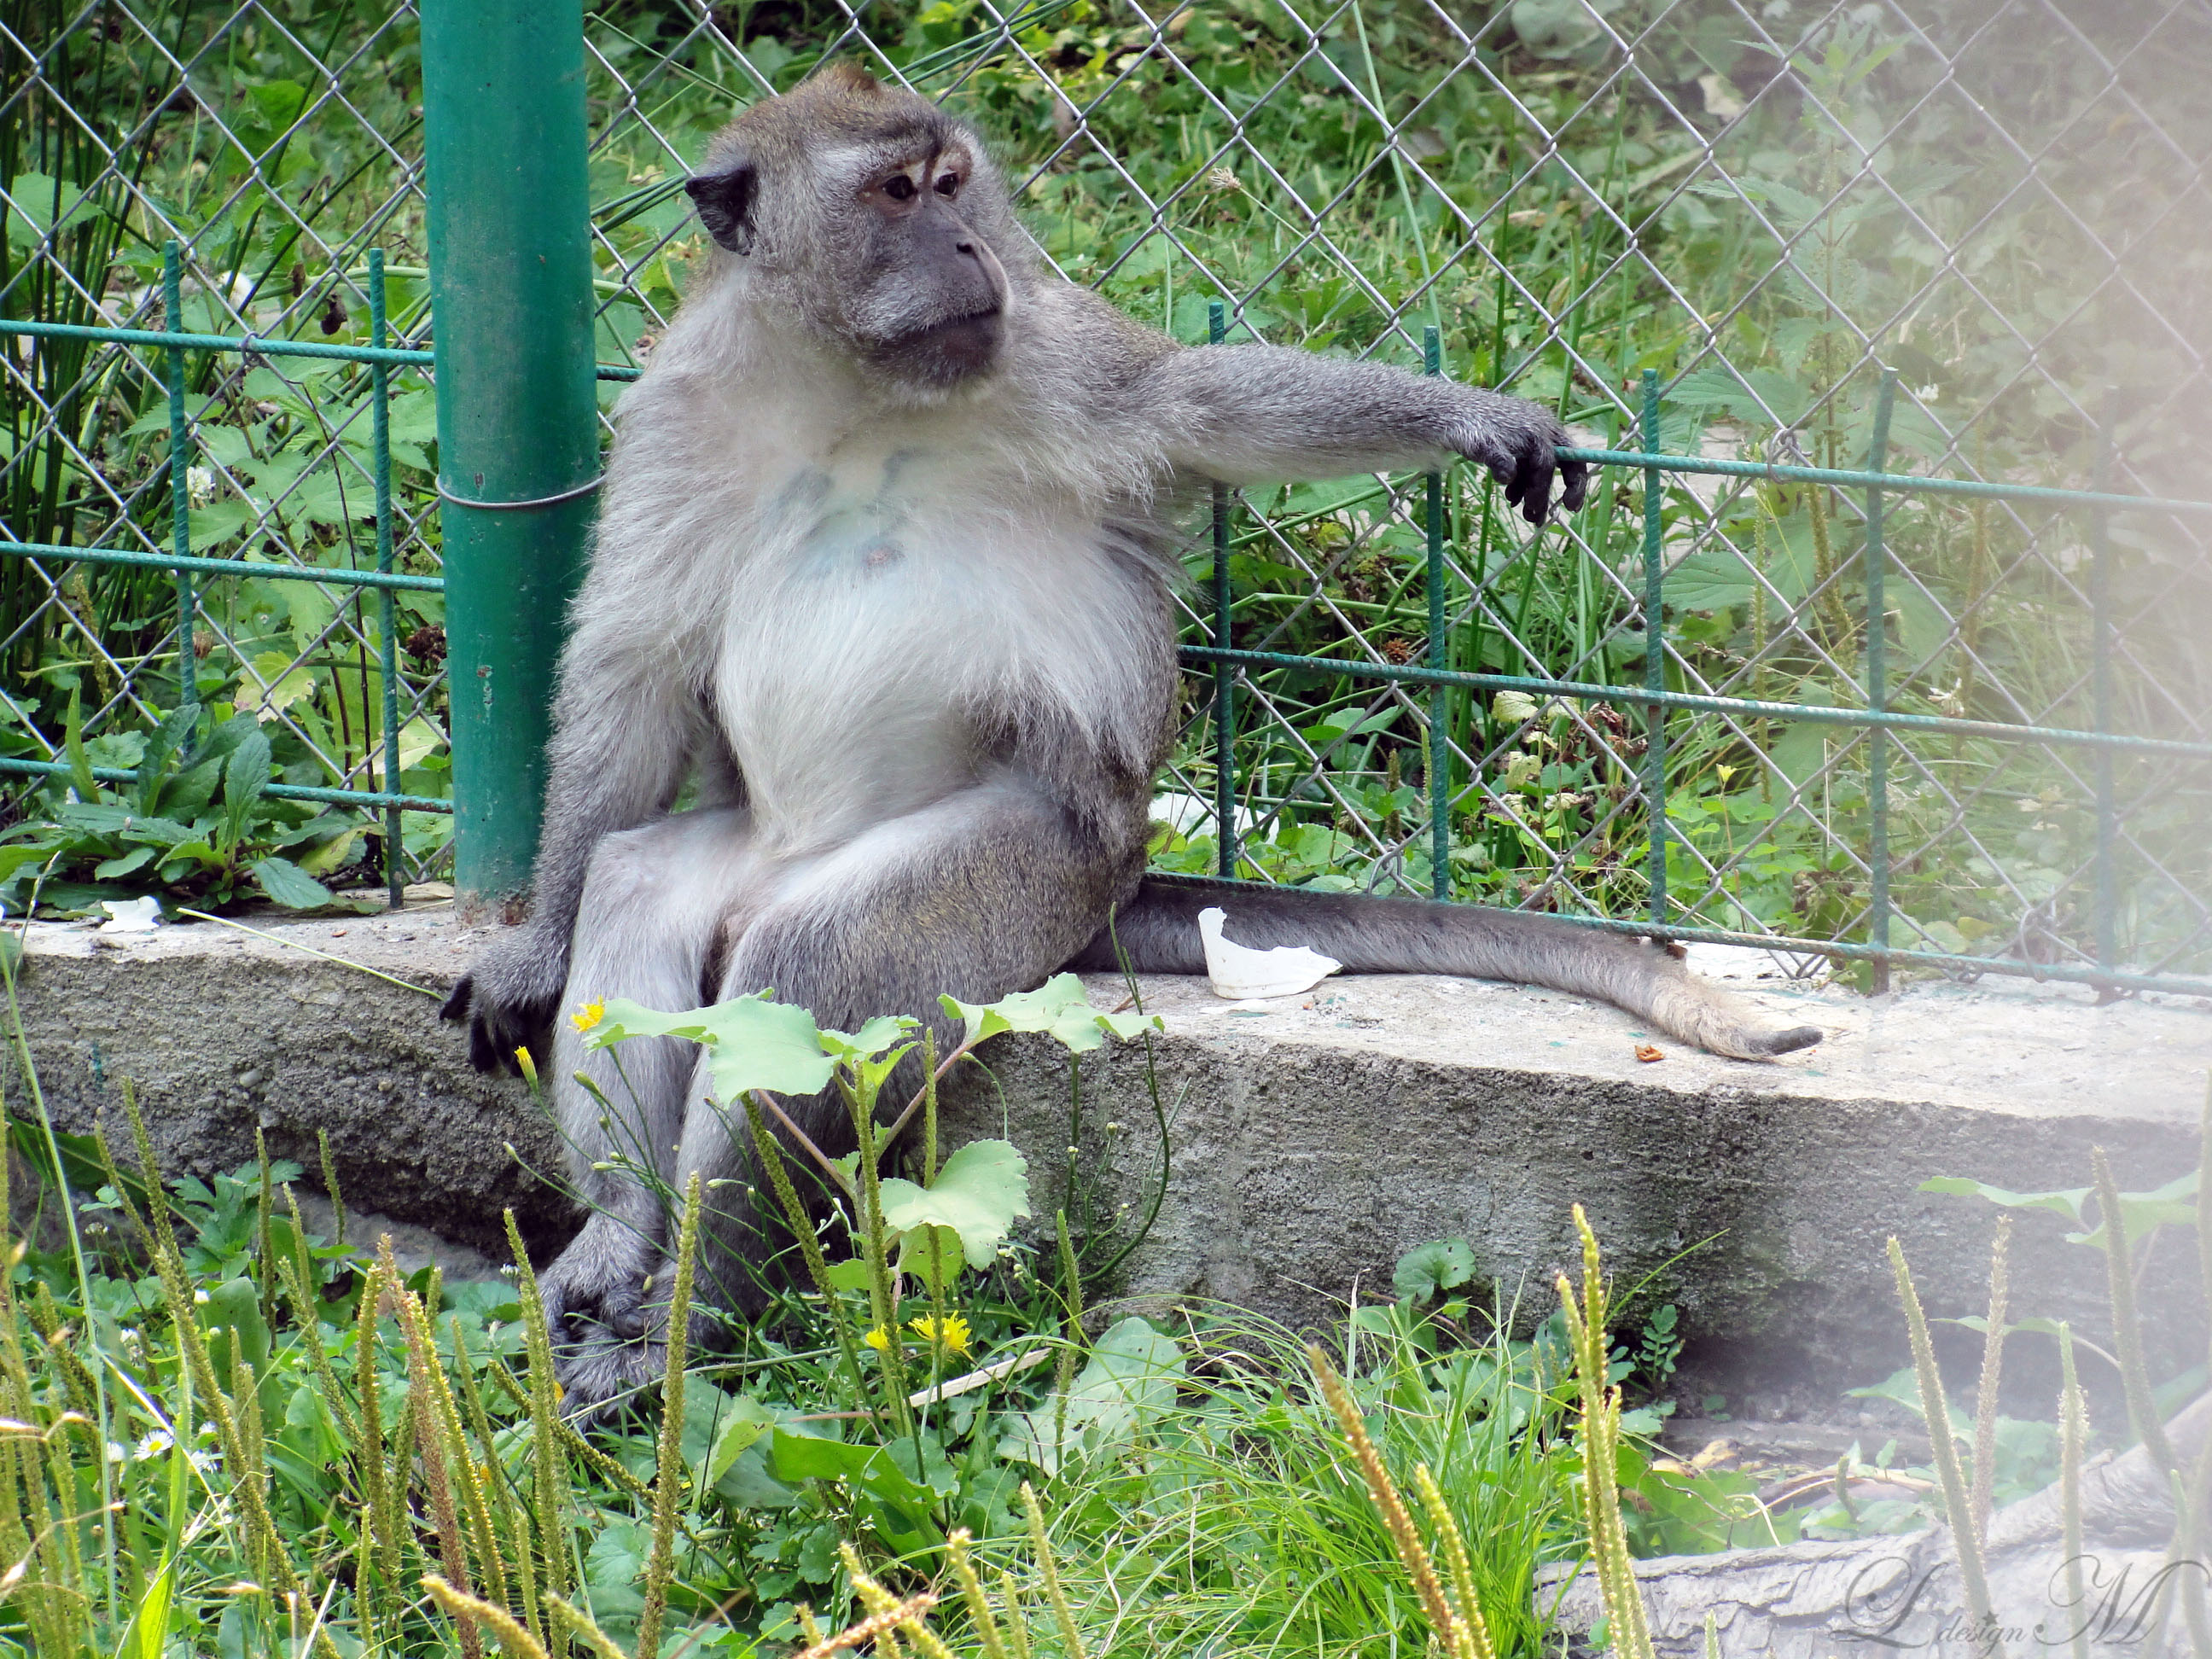 gradina-zoologica-zoo-Sibiu-Romania-in-imagini-poze-mainuta-monkey